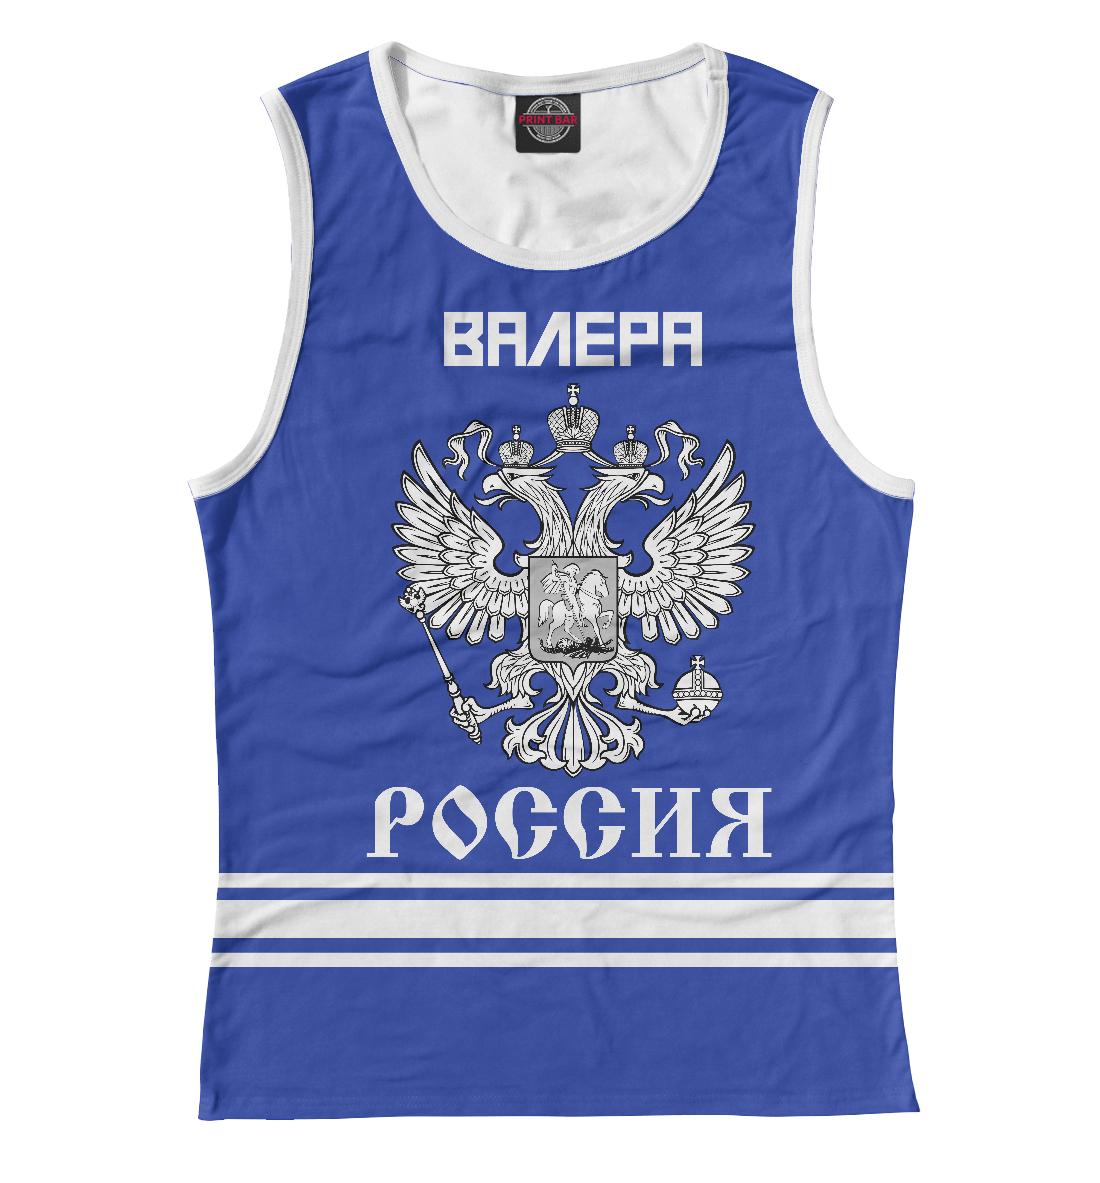 Купить ВАЛЕРА sport russia collection, Printbar, Майки, VLR-458019-may-1